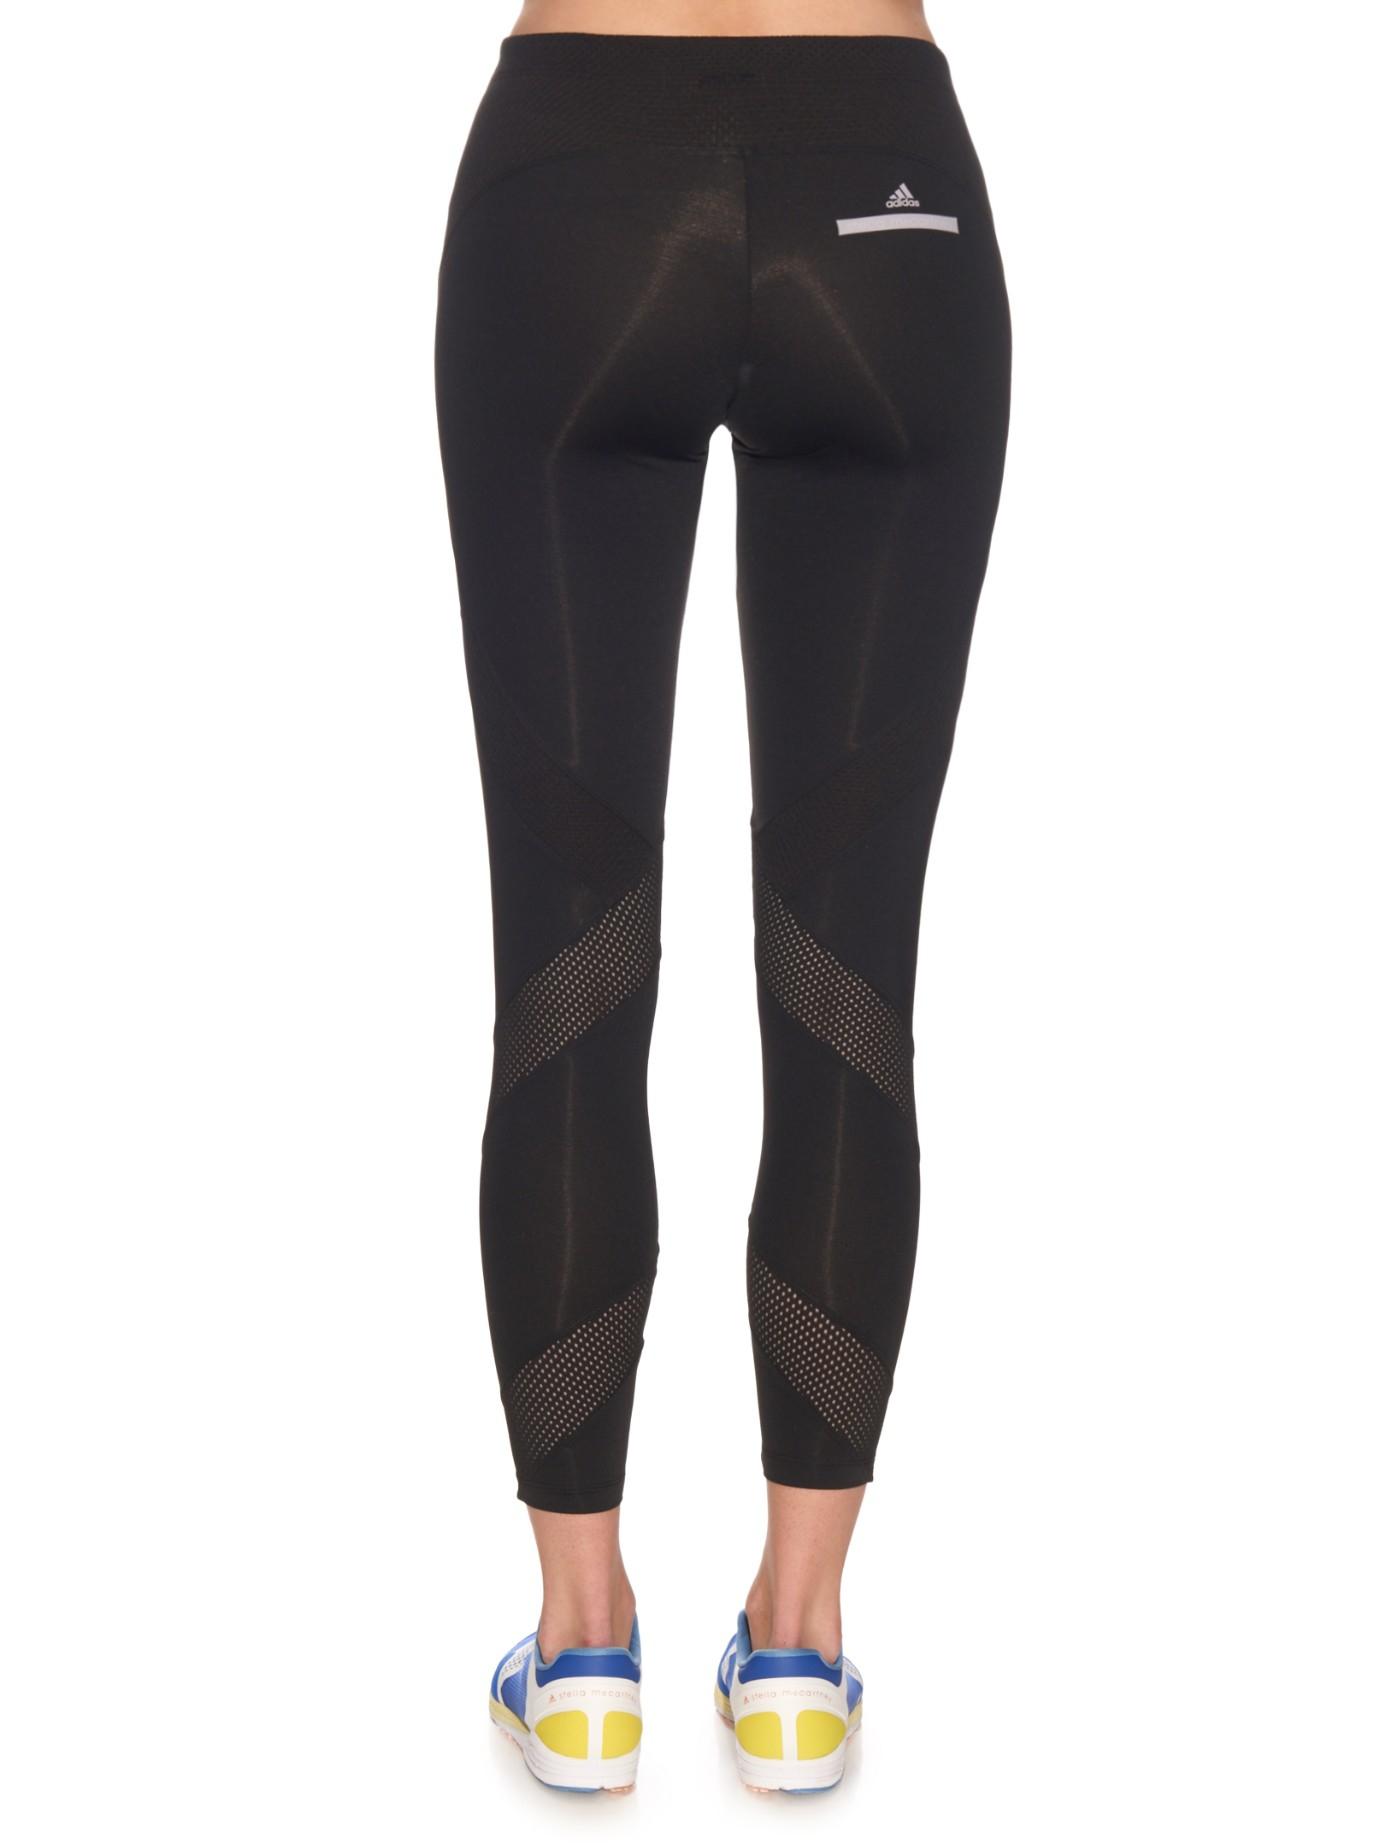 Mesh Stella Adidas Performance Panel Cropped By Mccartney Lyst w7IE1q8x1